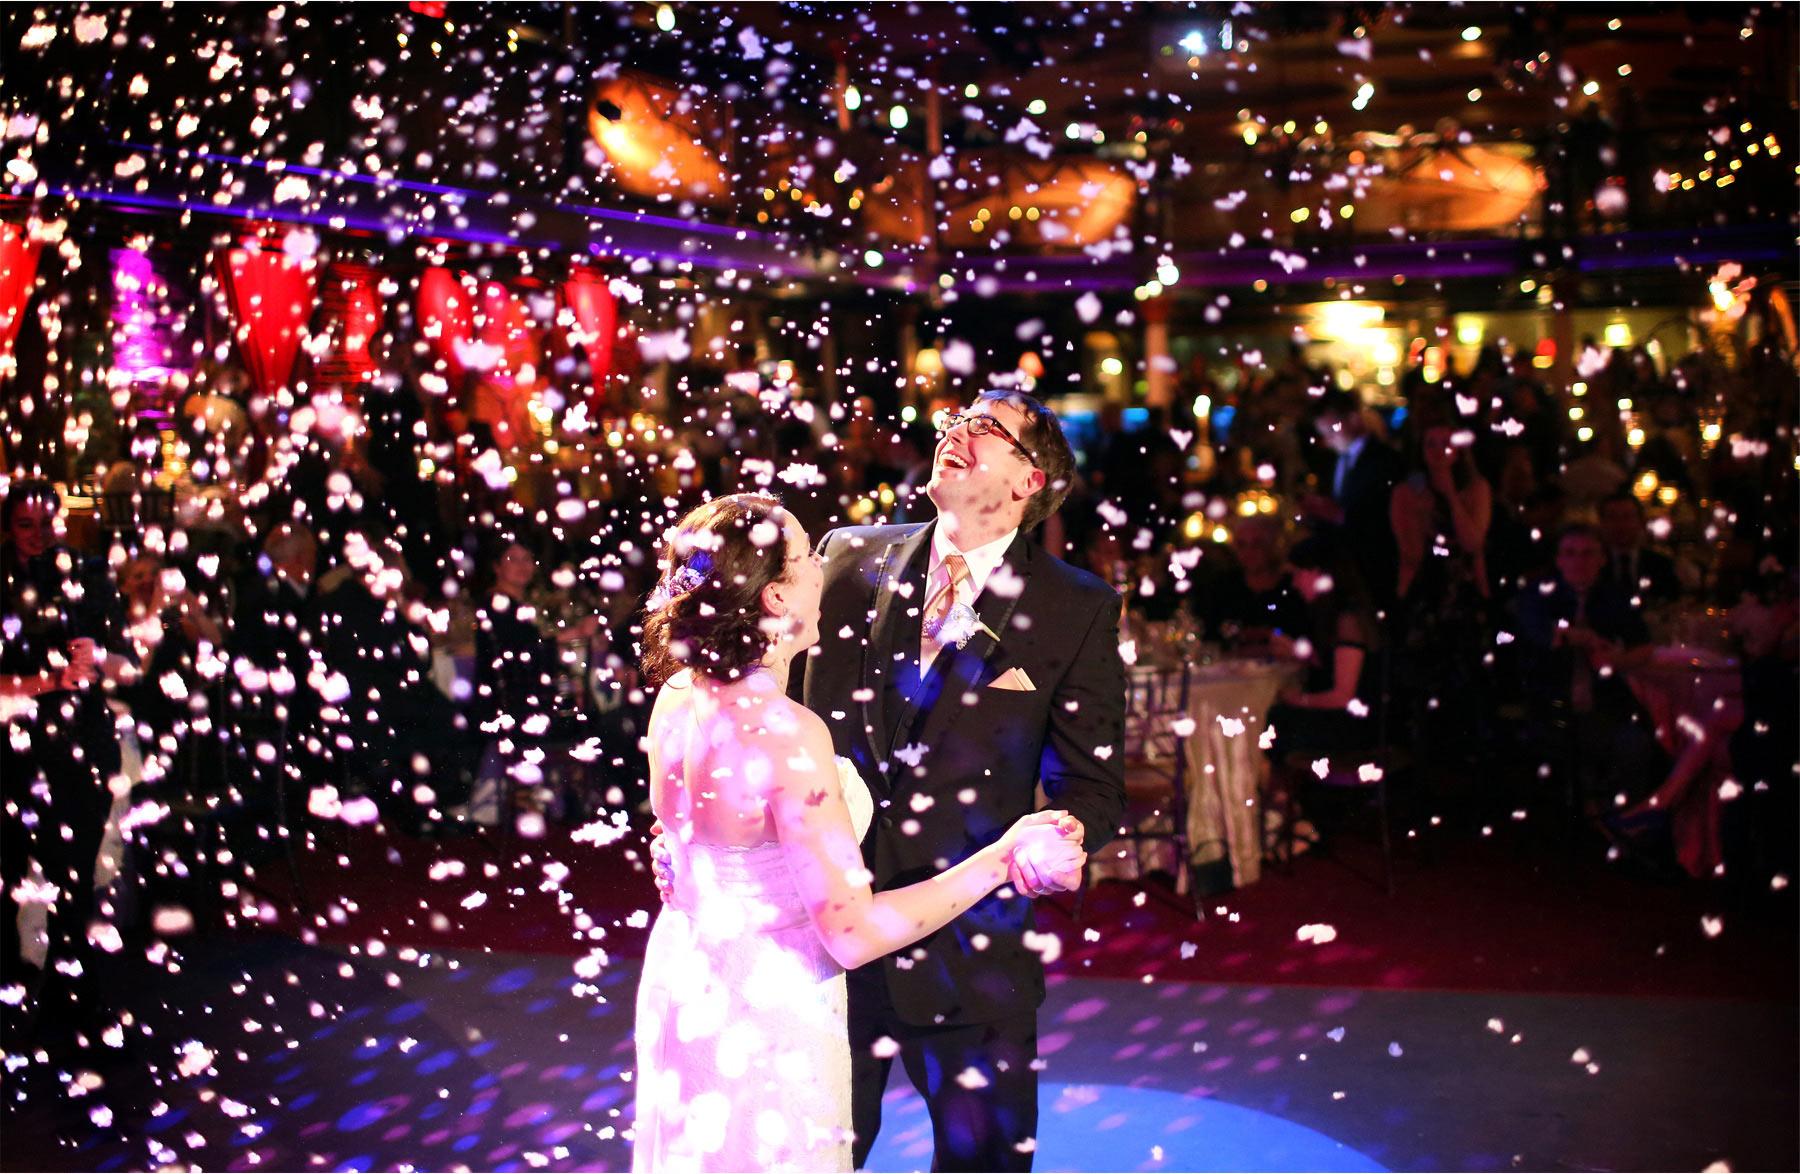 20-Minneapolis-Minnesota-Wedding-Photographer-by-Andrew-Vick-Photography-Winter-Varsity-Theater-Reception-Bride-Groom-Dance-Snow-Confetti-Sara-and-Rob.jpg